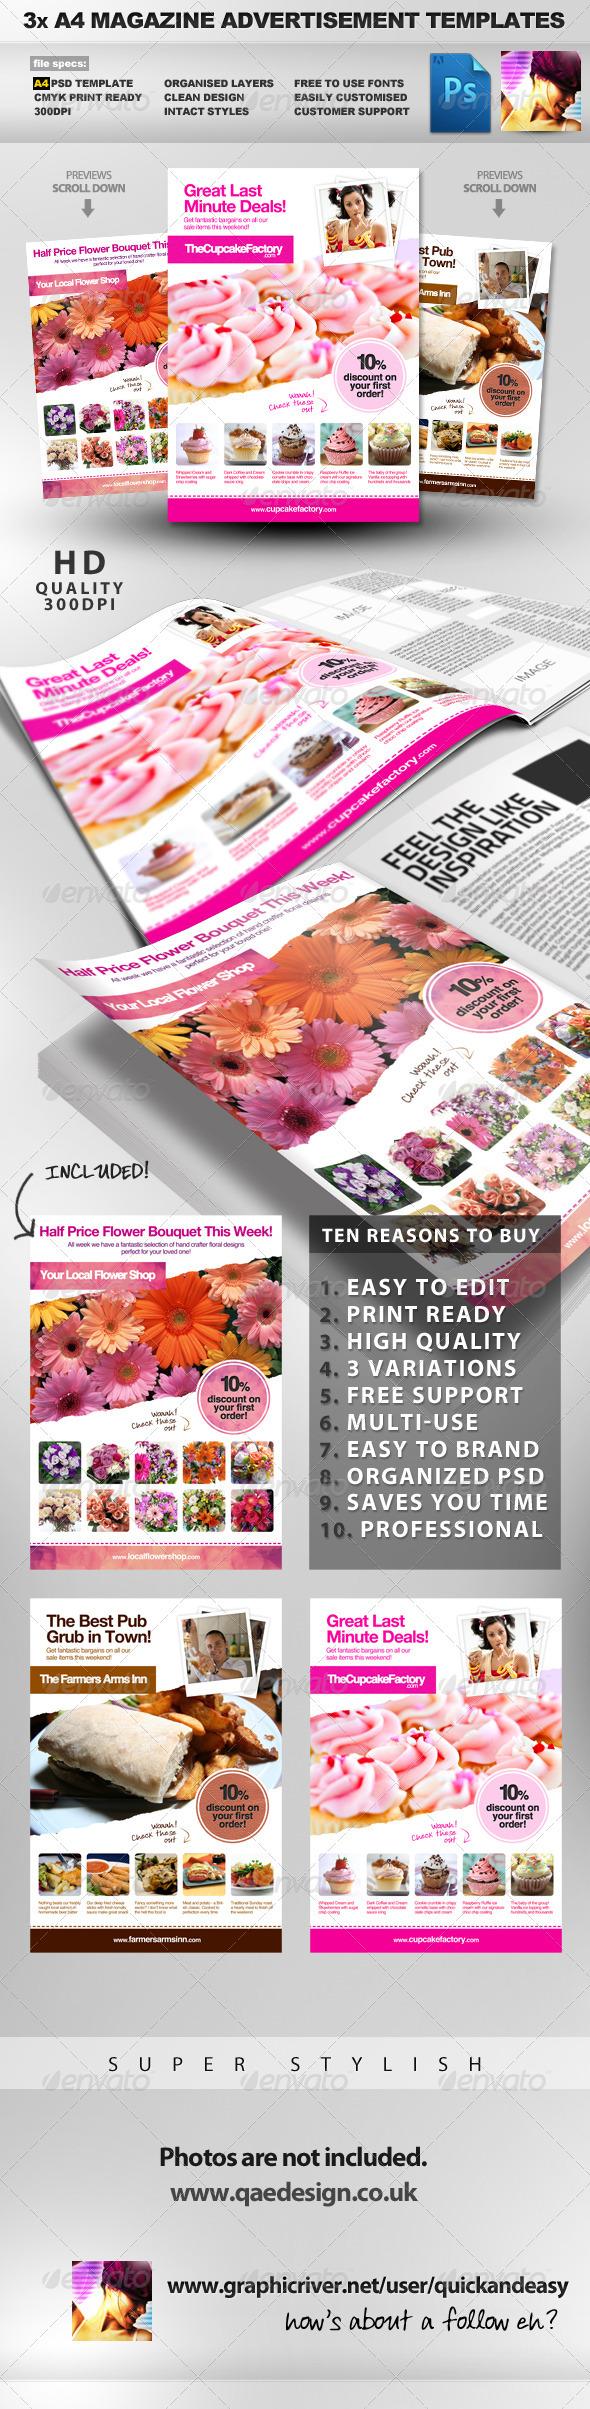 magazine ad template psd autoblogger24 magazine ad template psd 3x a4 psd magazine advert magazine ad template psd